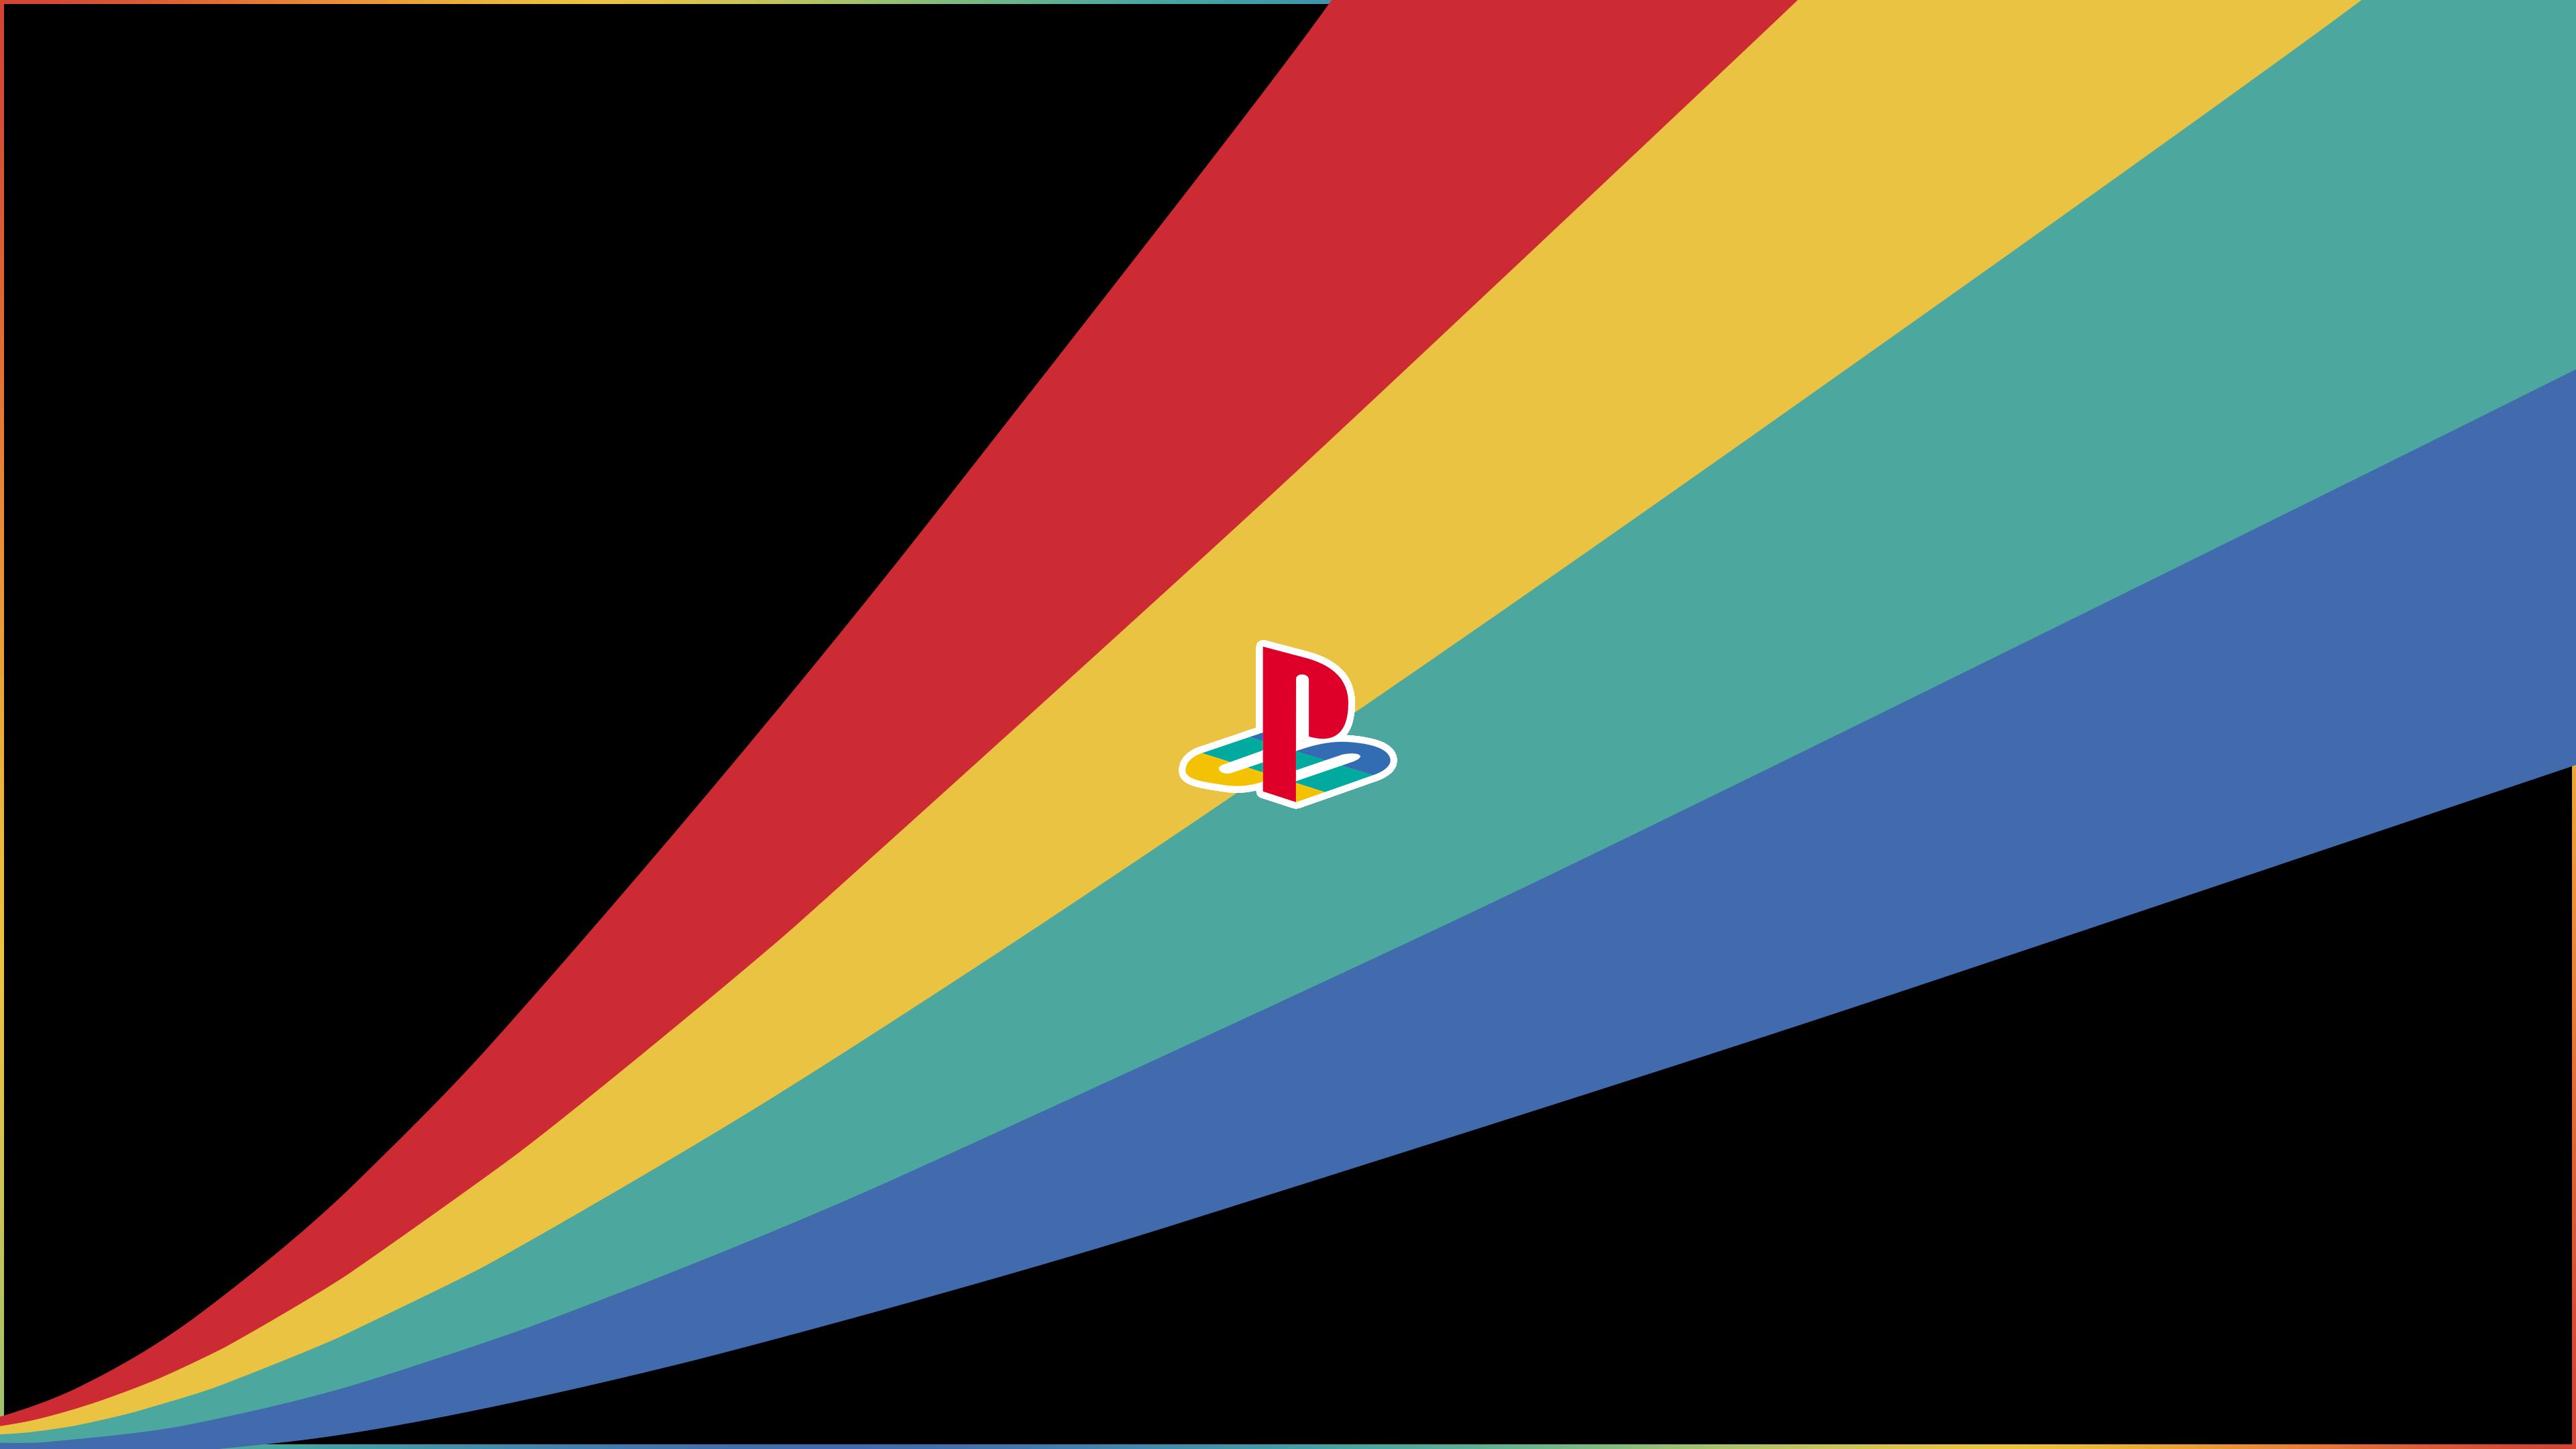 Playstation Minimalist Curve Burst 3840x2160 R Wallpaper Wallpaper Desktop Background Images